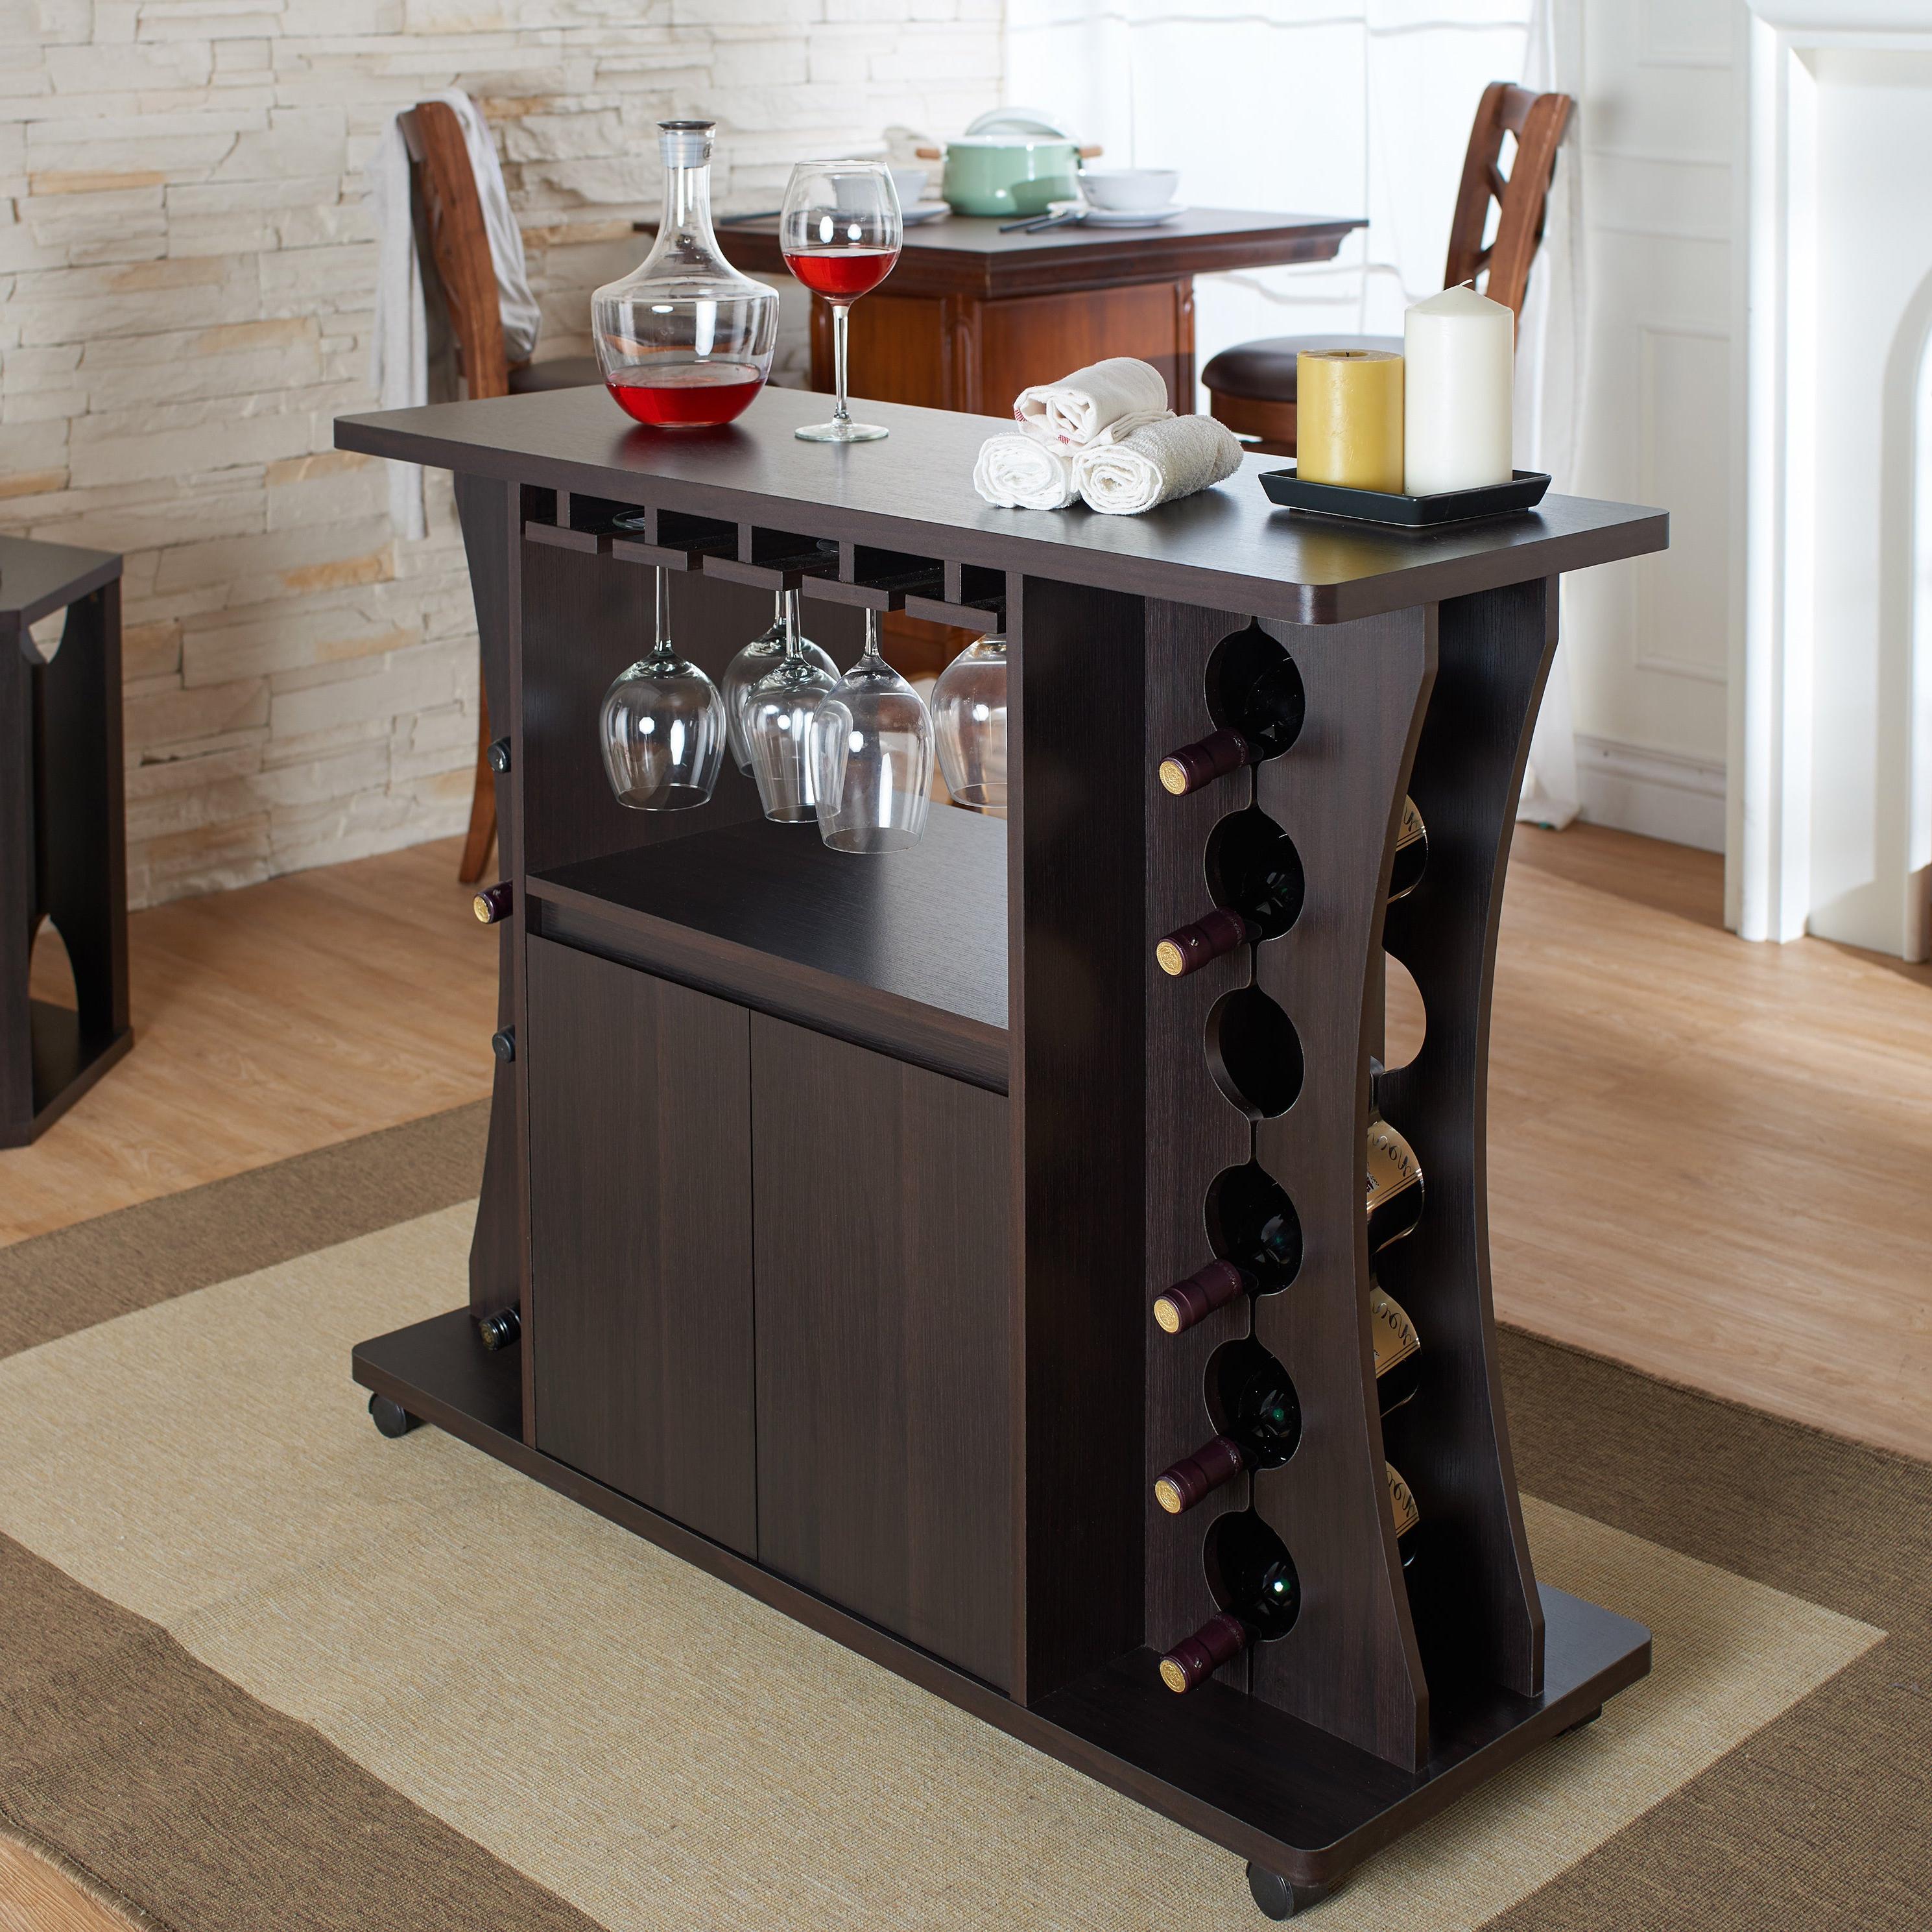 Porch & Den Northlawn Espresso Buffet With Wine Rack Regarding Espresso Wood Multi Use Buffets (View 3 of 20)